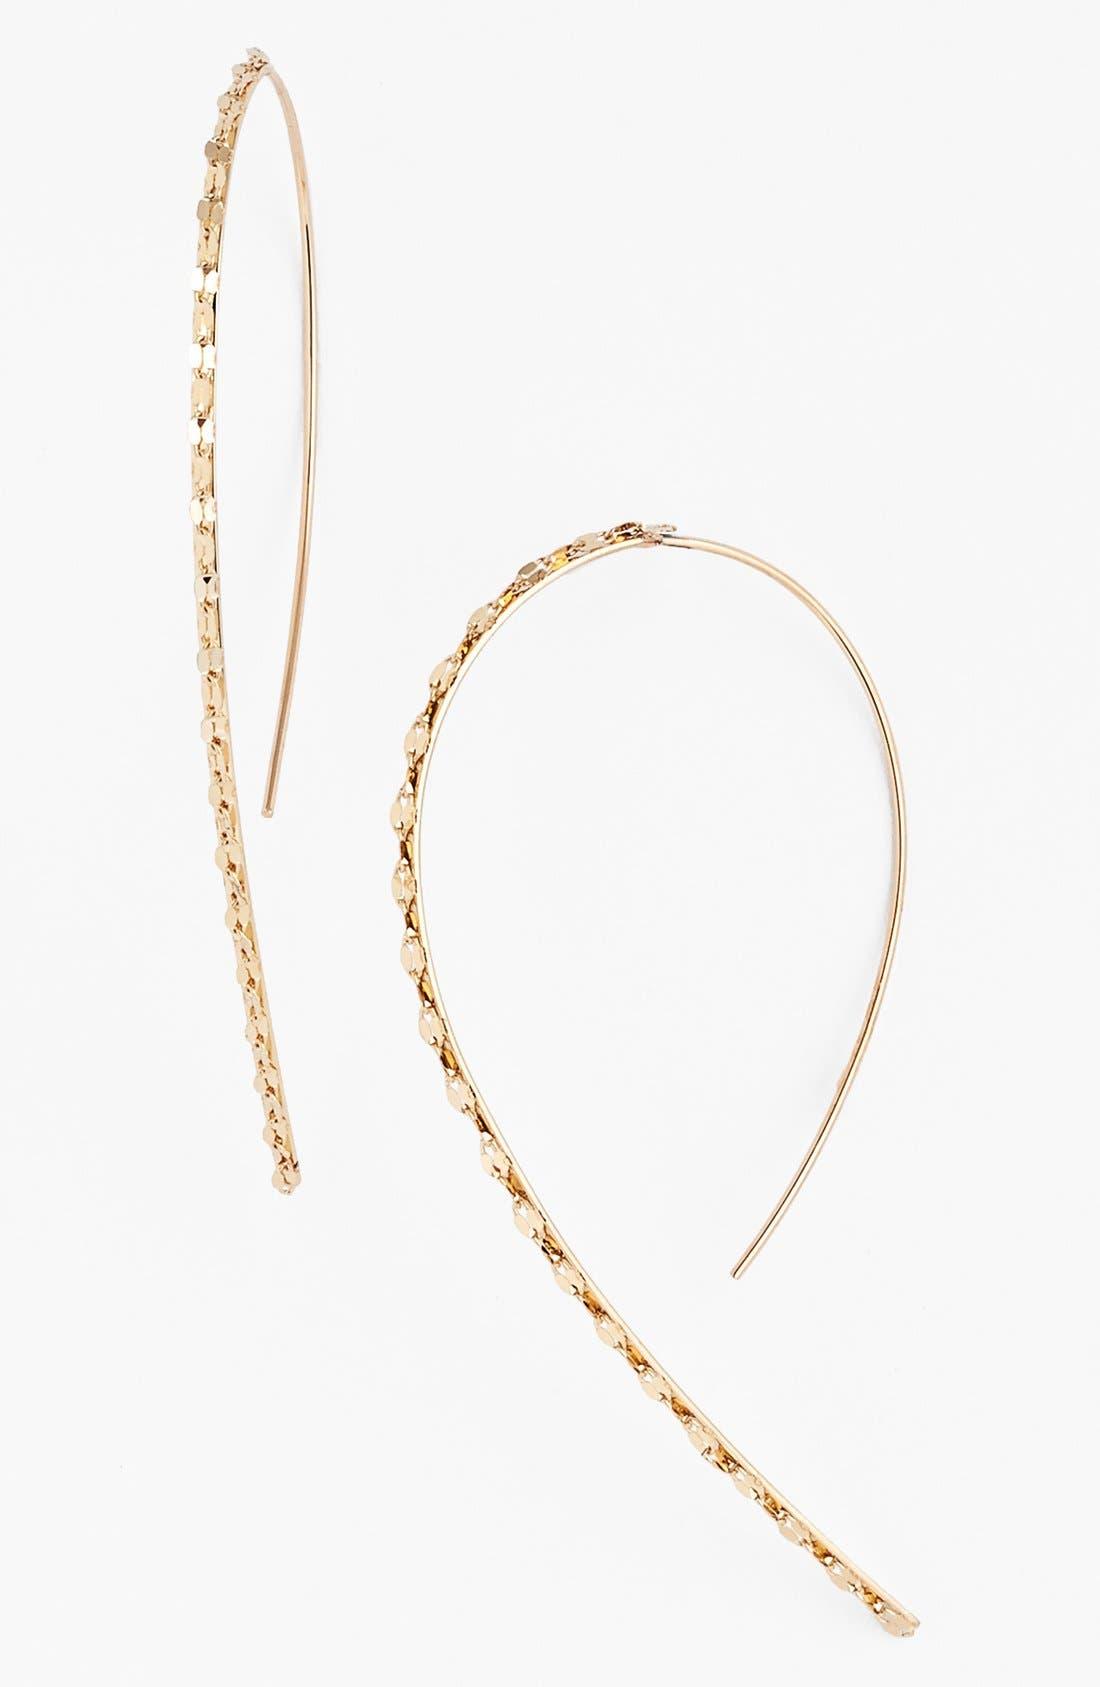 Main Image - Lana Jewelry 'Glam' Small Hooked-On Hoop Earrings